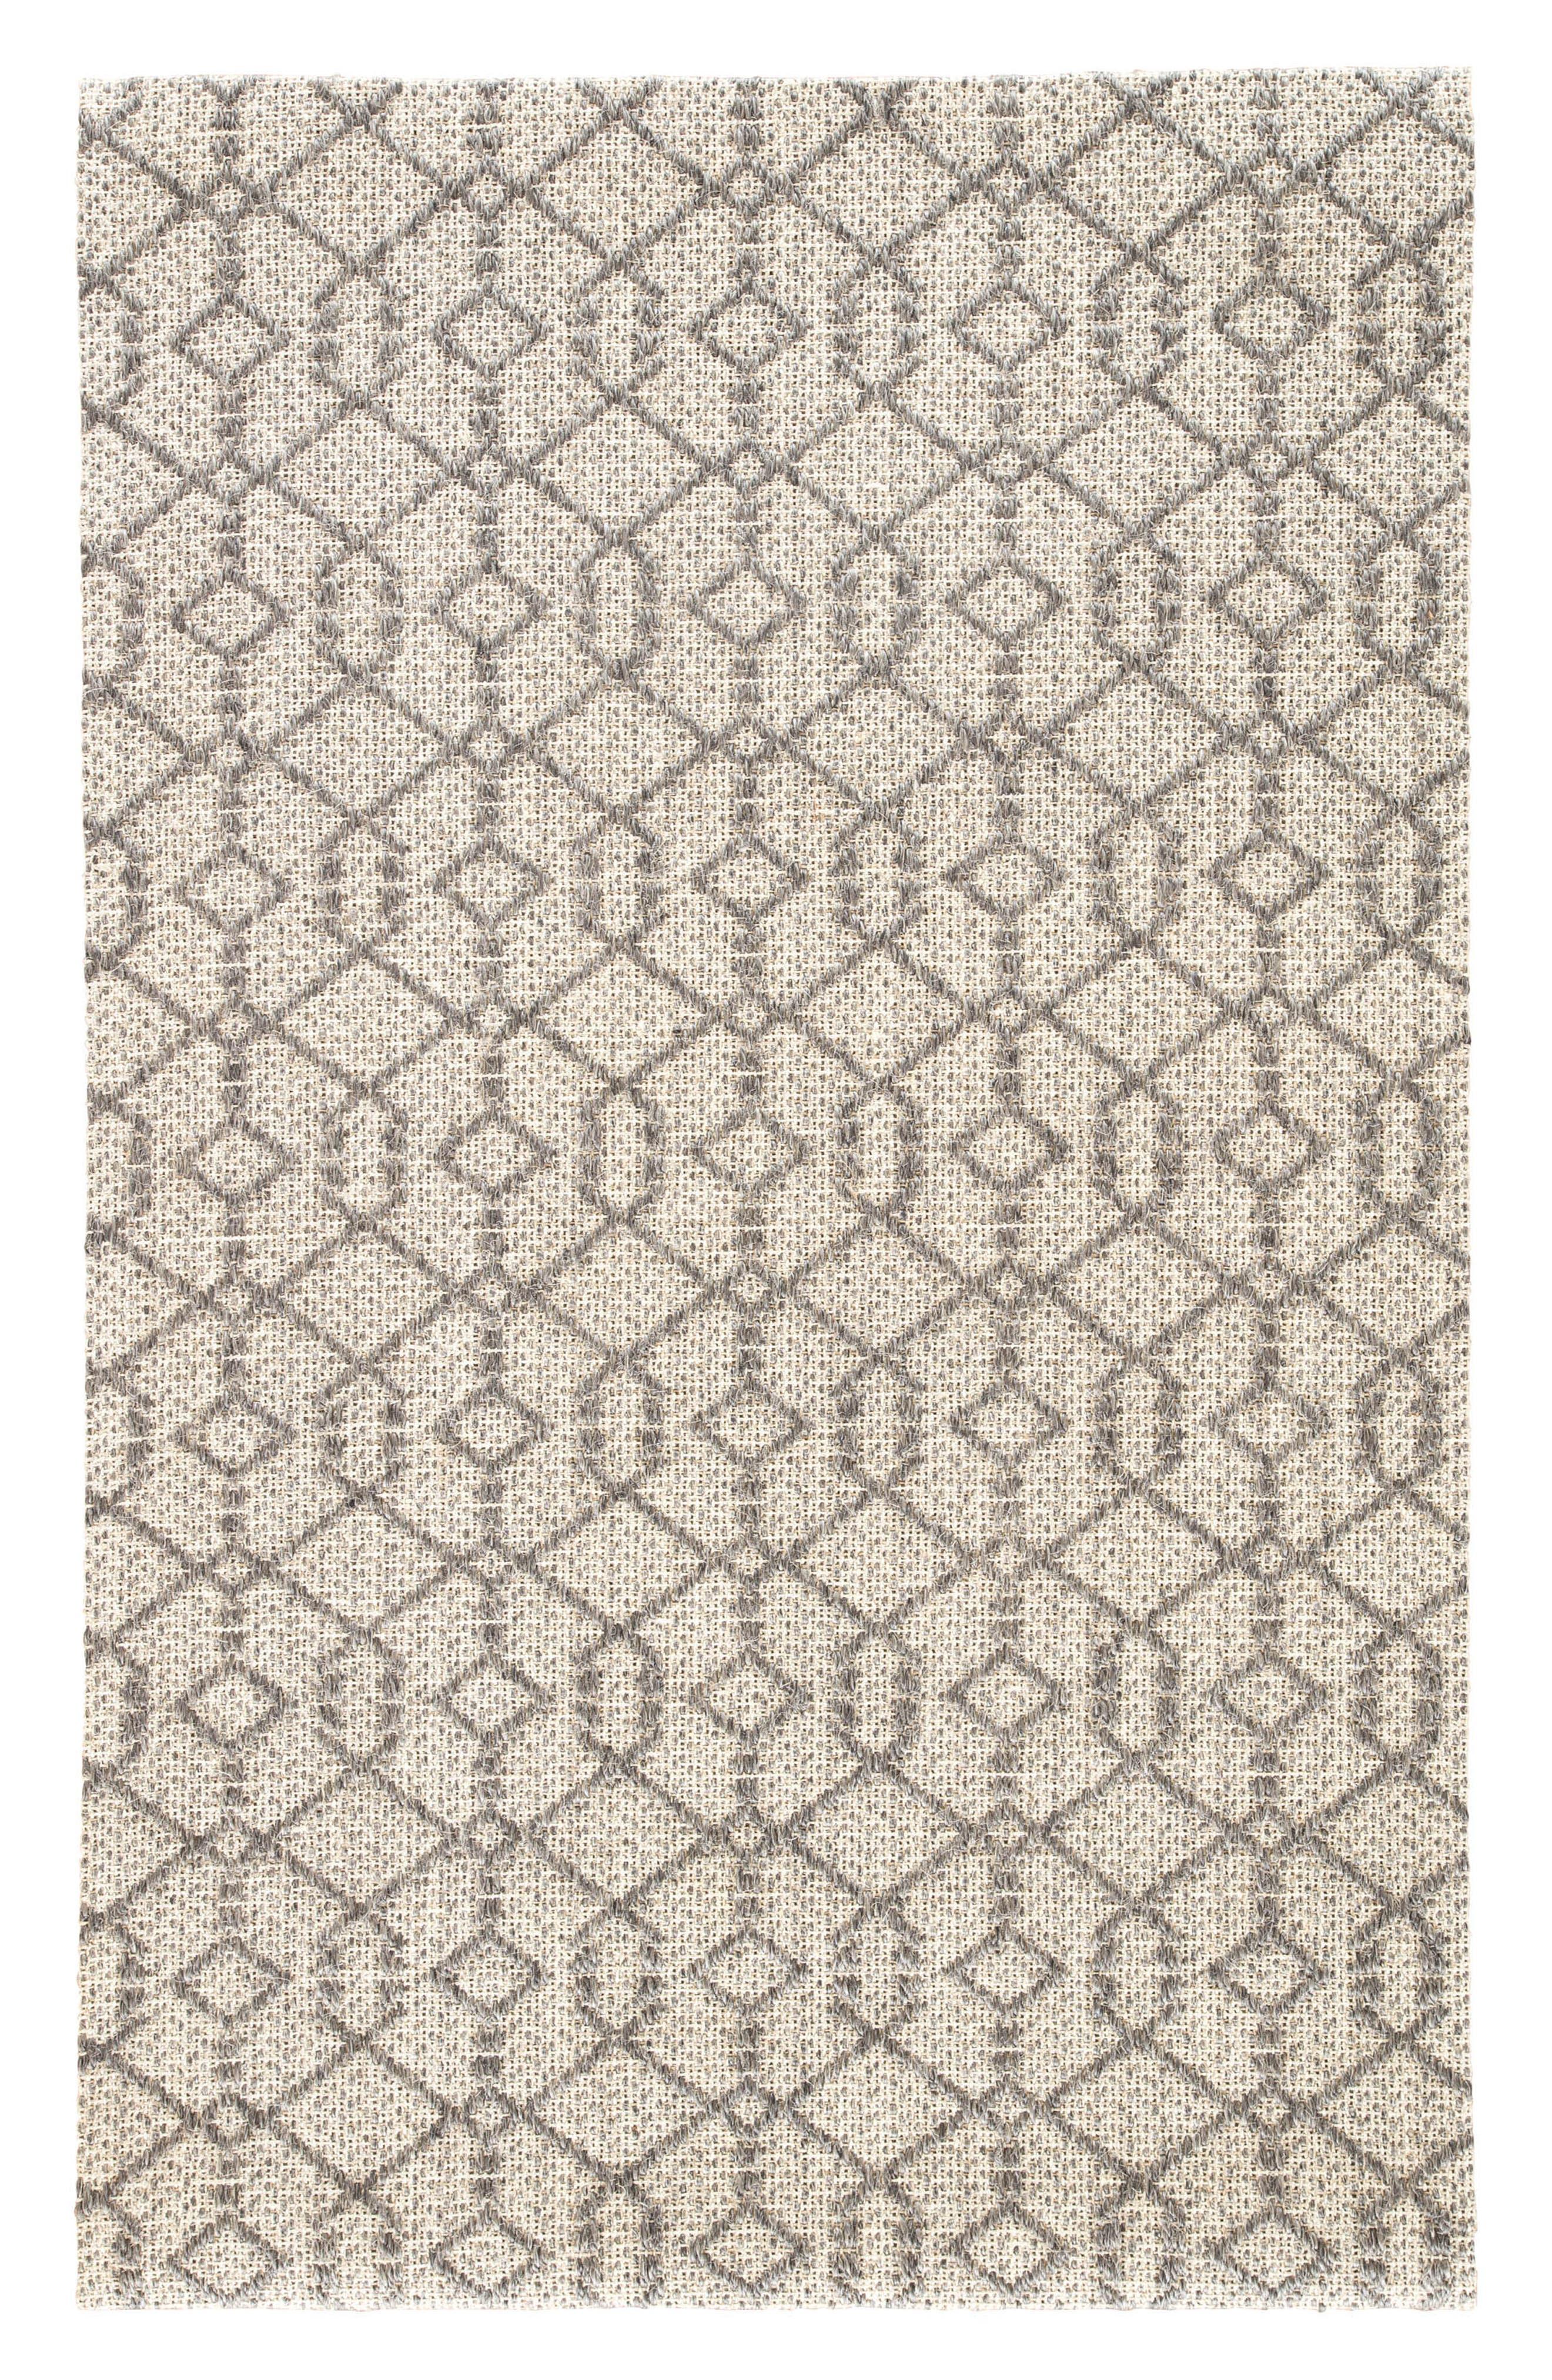 Baza Sisal Rug,                         Main,                         color, Charcoal Grey